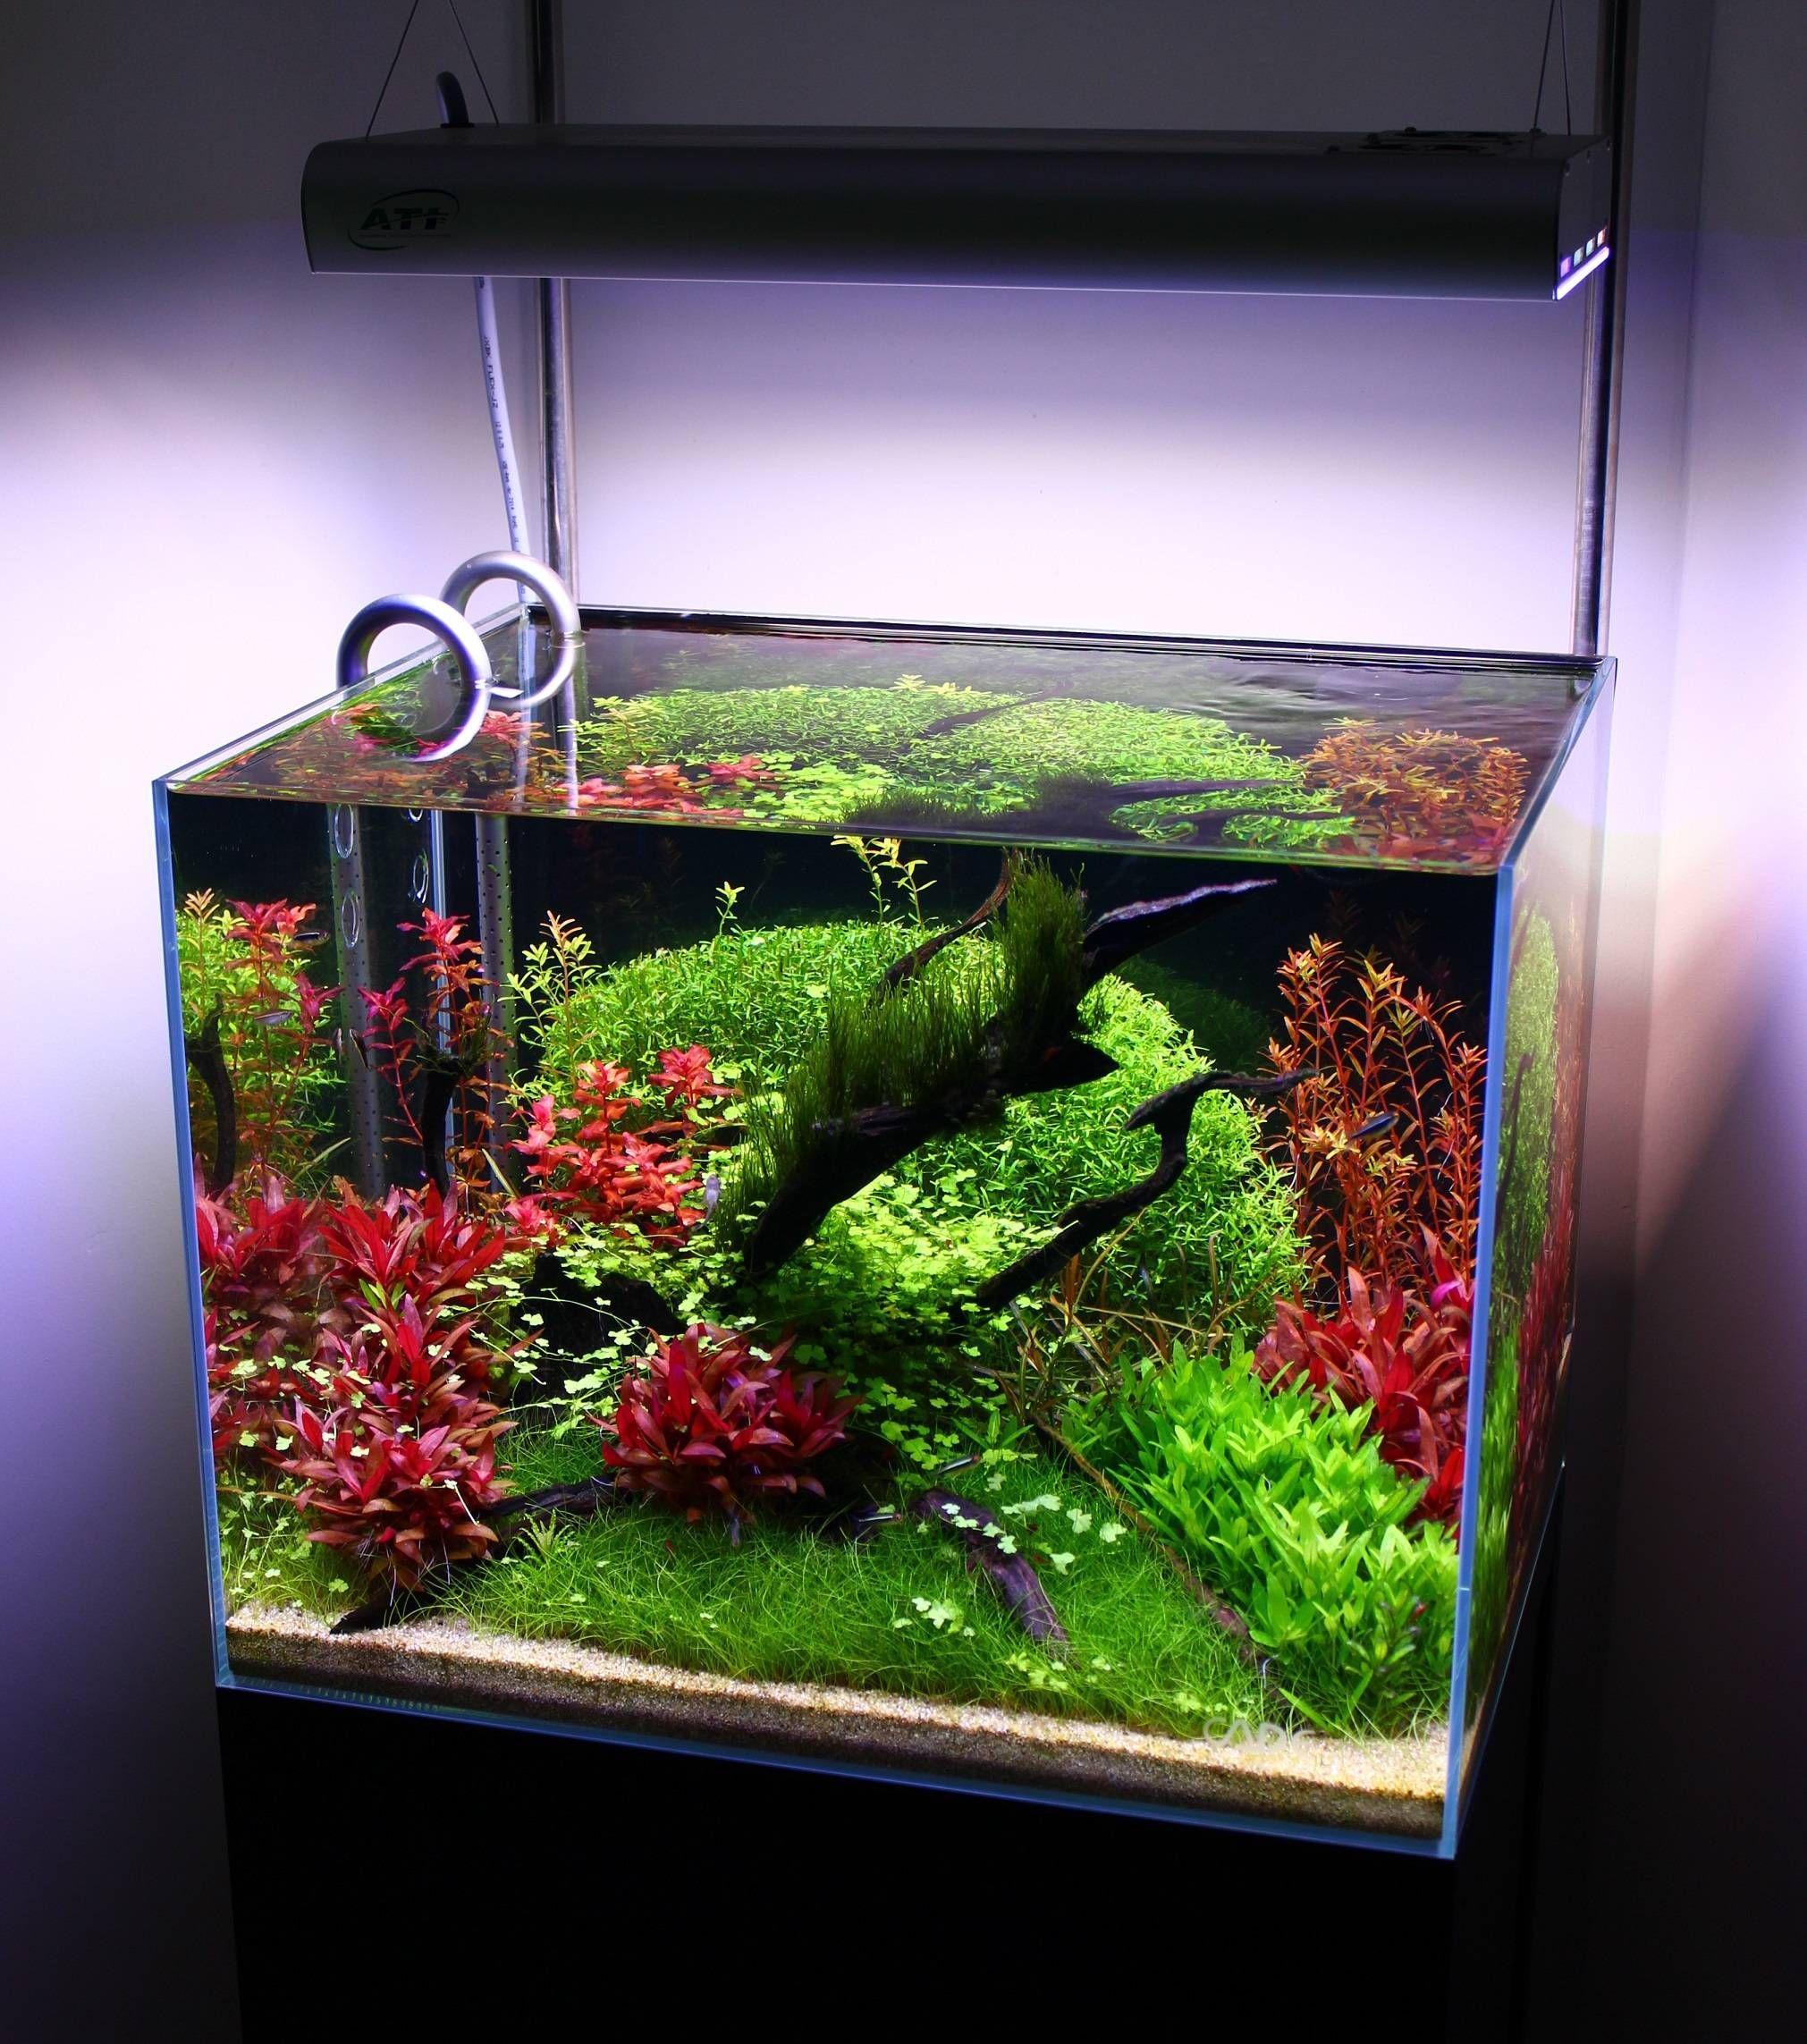 Fish for nano aquarium freshwater - Lovely Planted Tank Planted Aquariumaquarium Fishfreshwater Aquariumnano